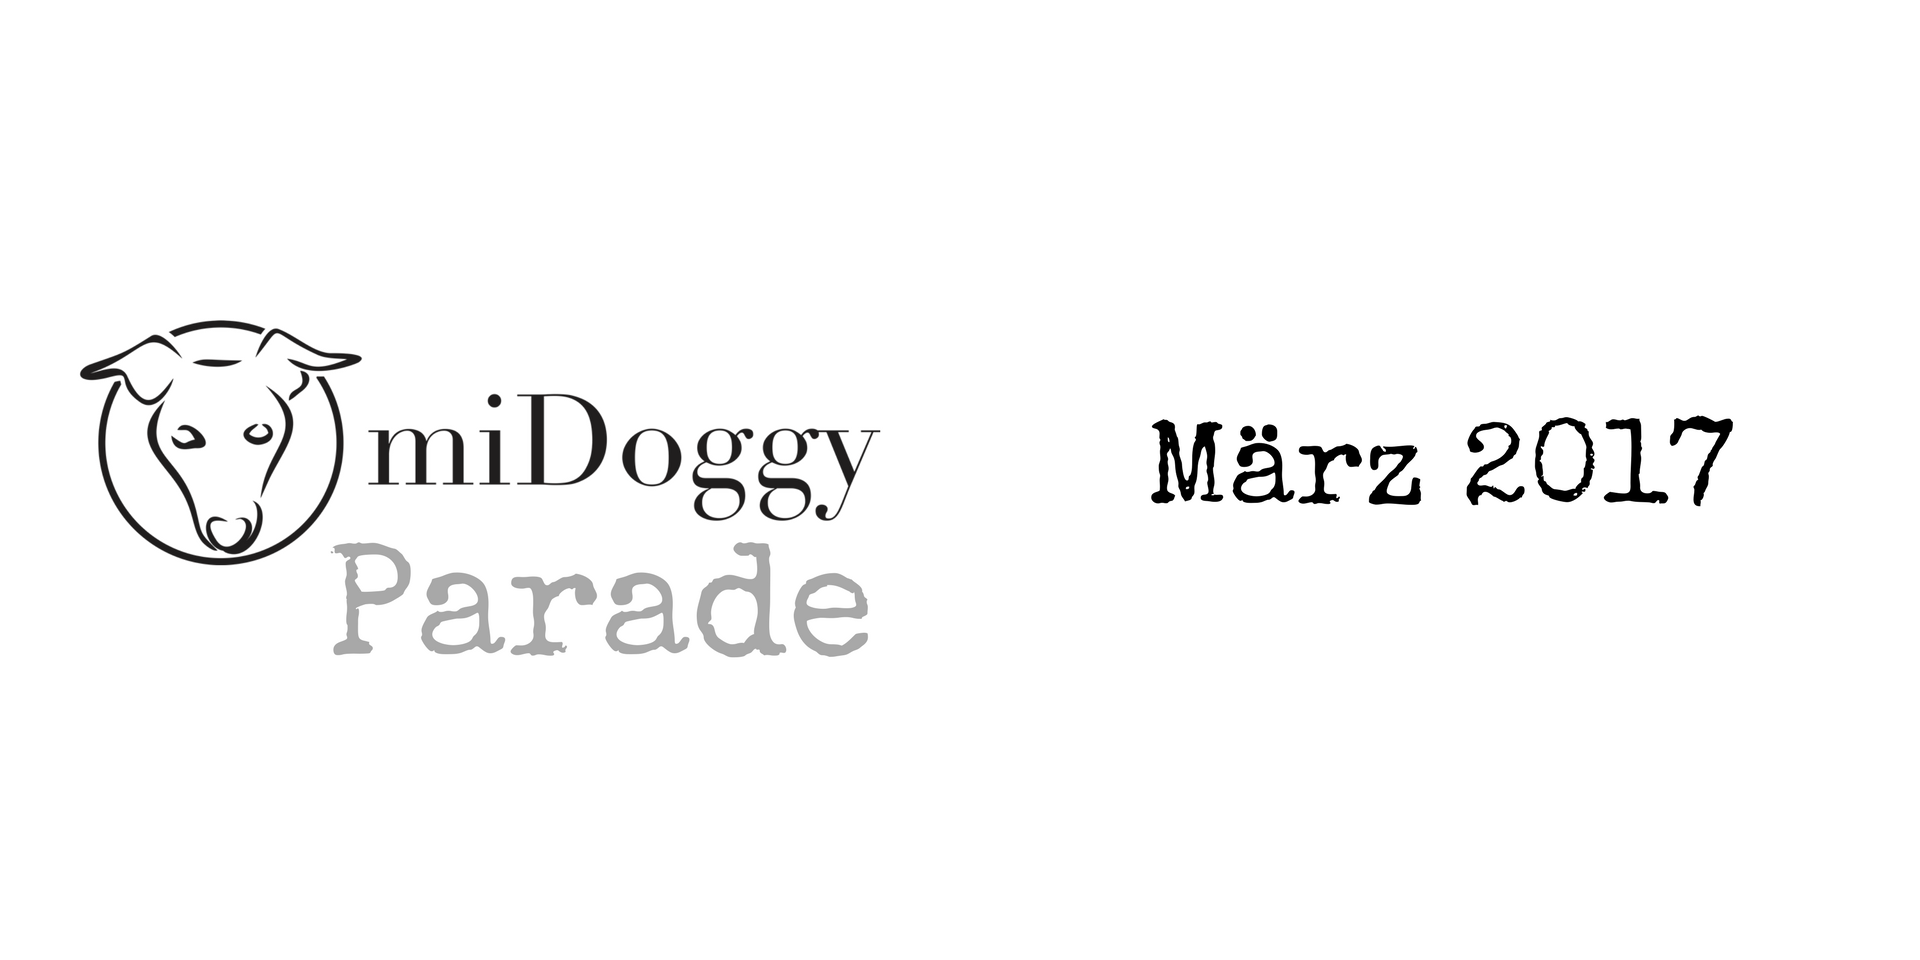 miDoggy Parade Blogparade Hundeblogger März 2017